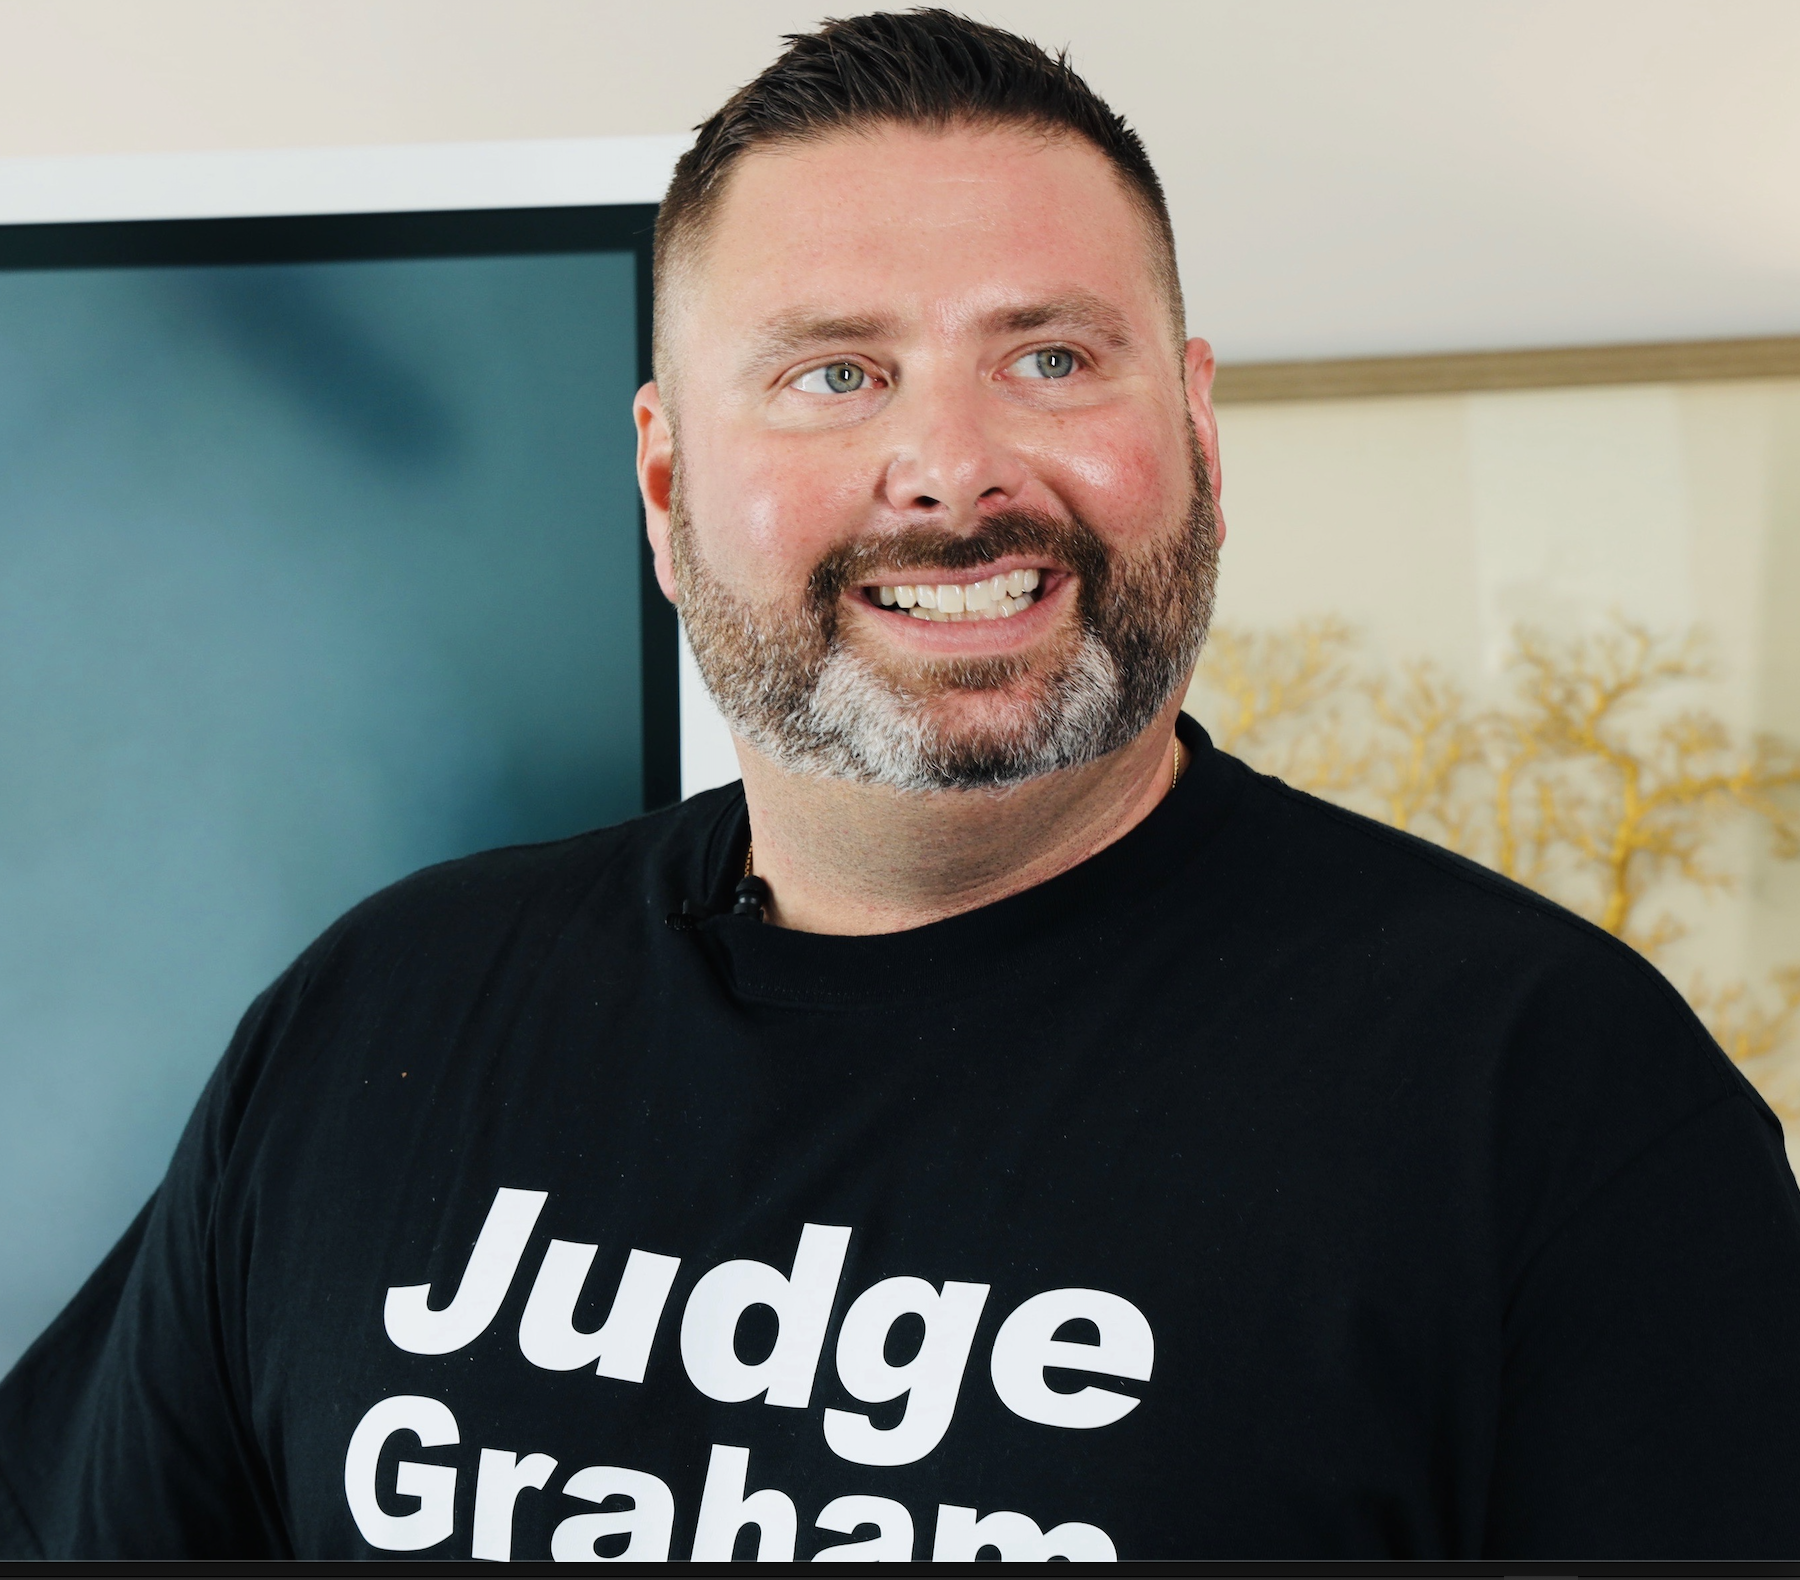 Judge Graham